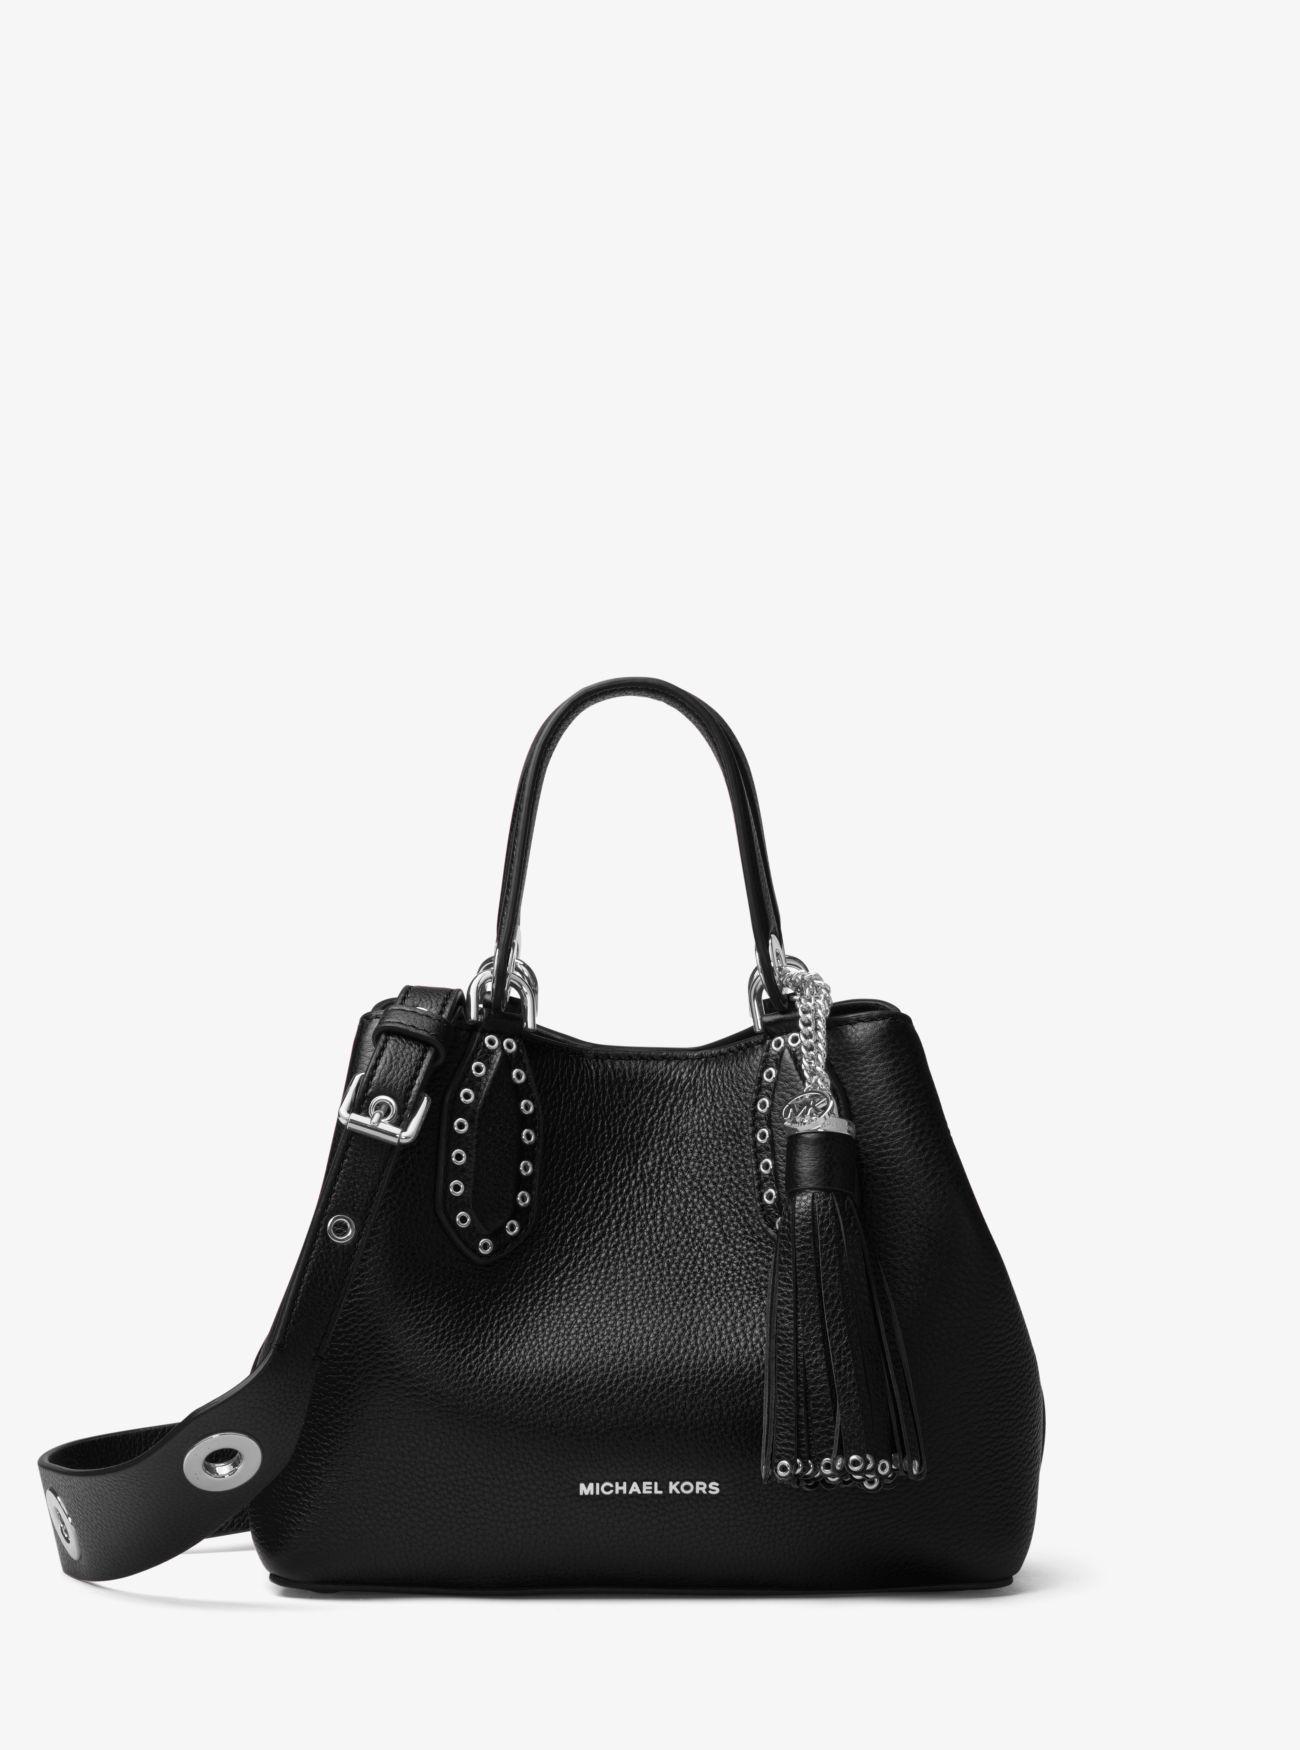 77423798af95 Michael Kors - Black Brooklyn Small Leather Satchel - Lyst. View fullscreen